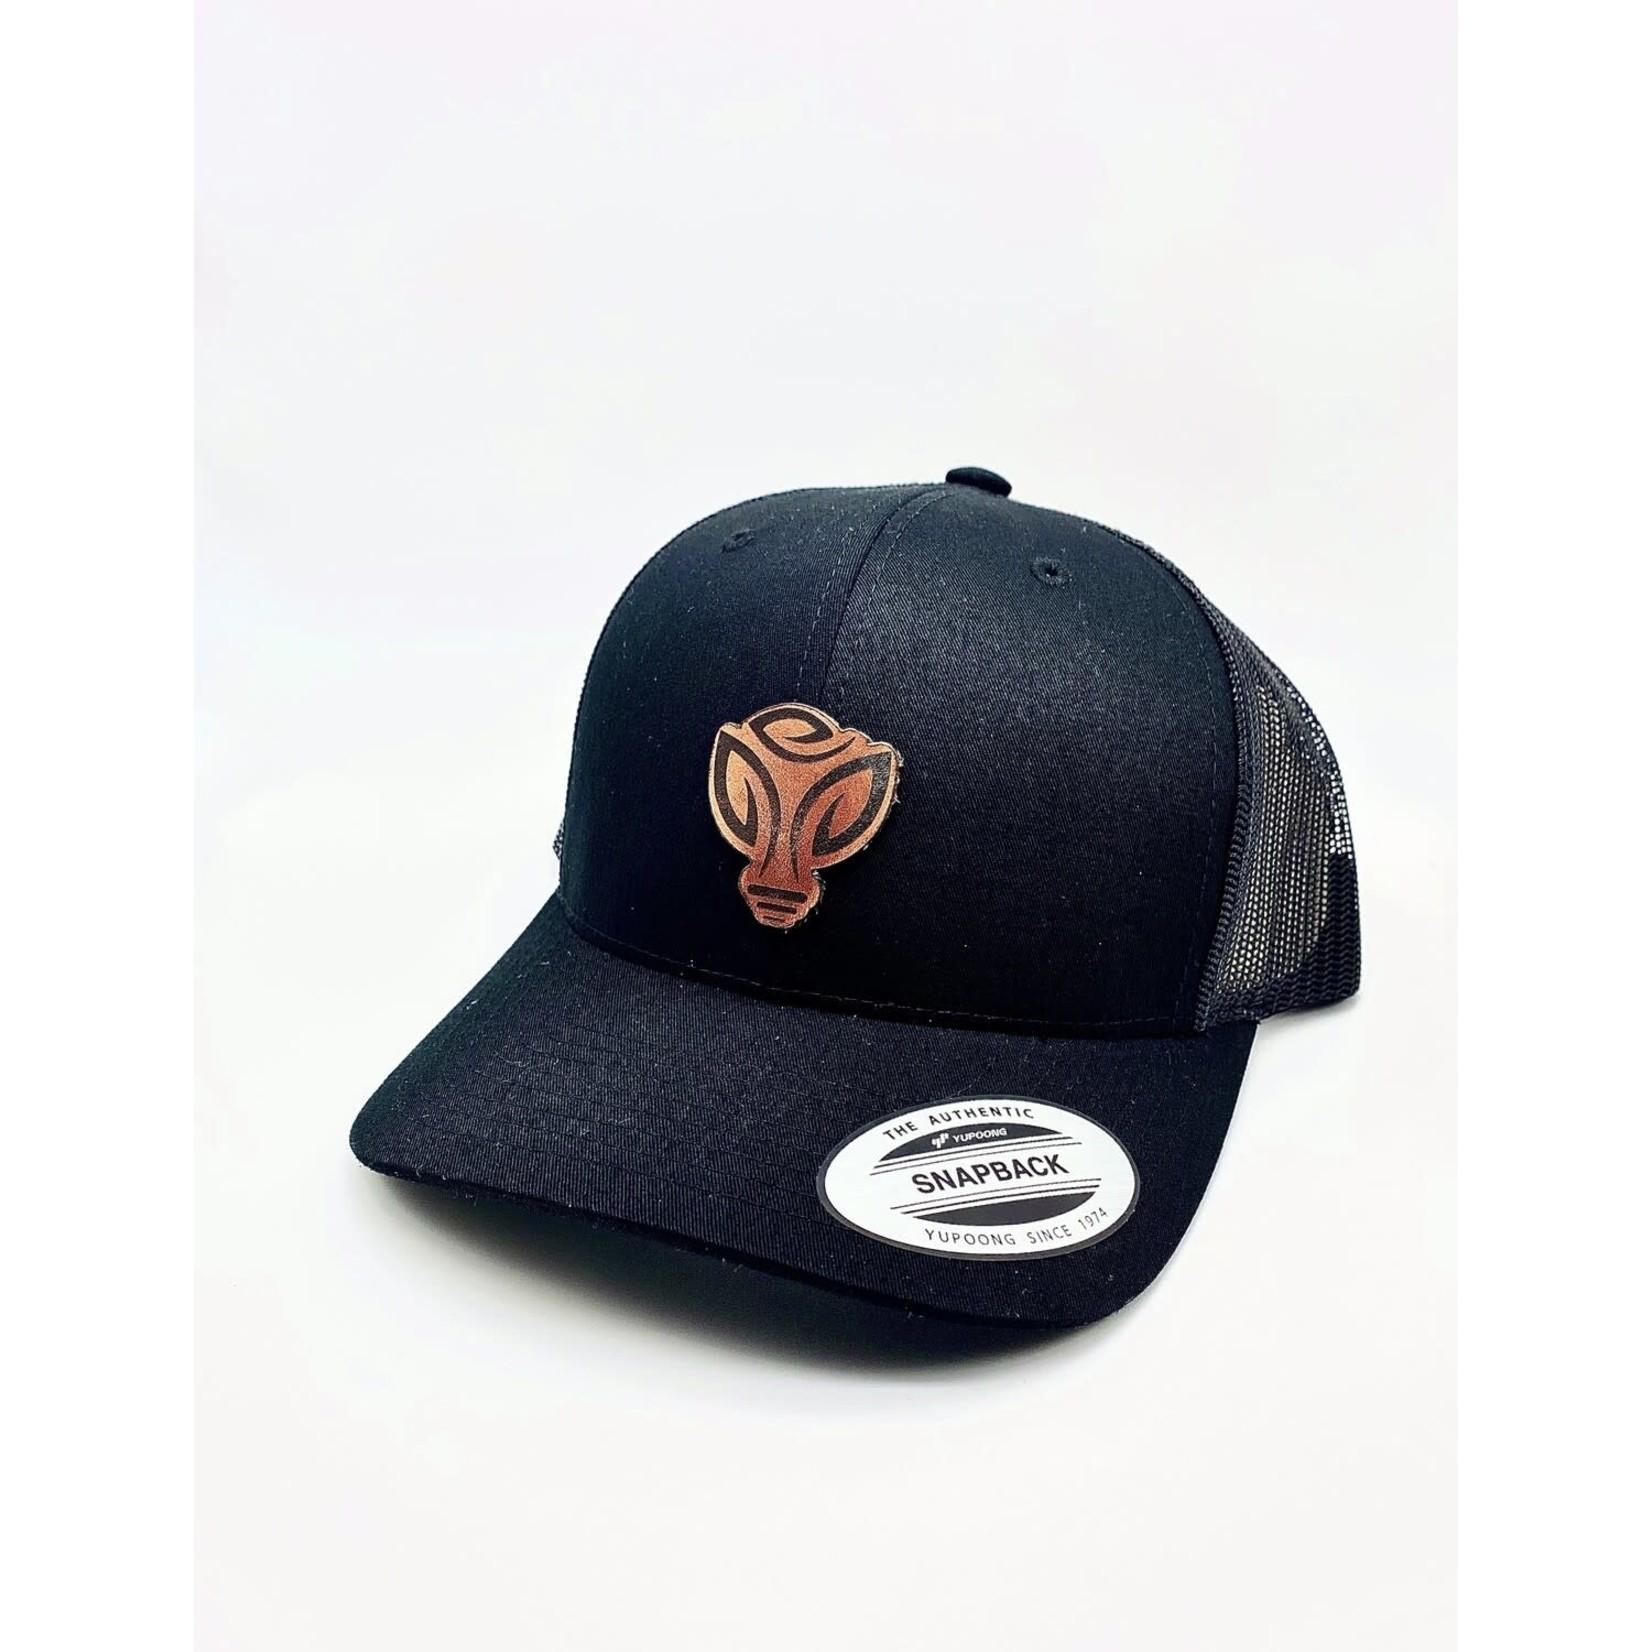 GLAC GLAC All Black Snapback Hats